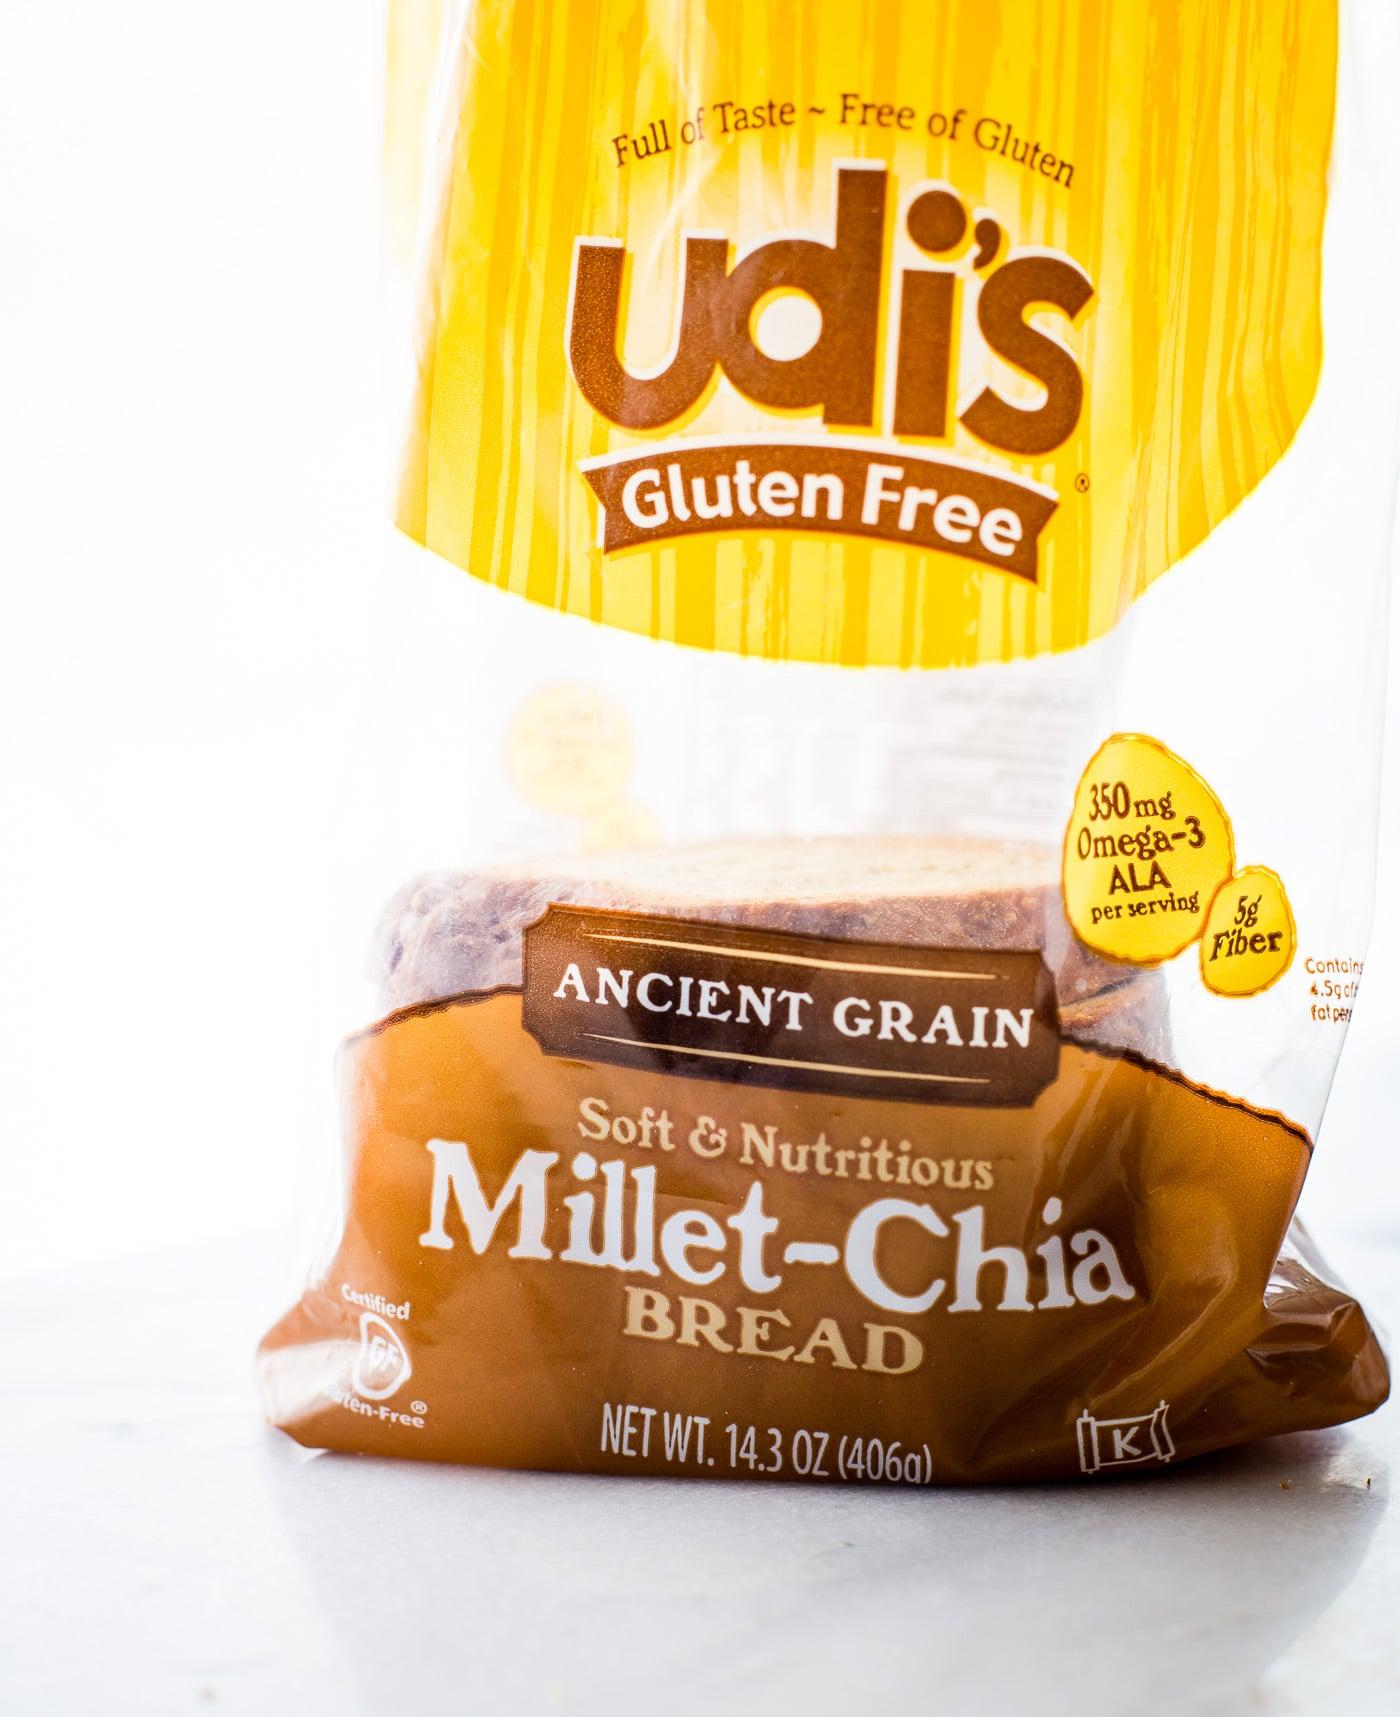 Udis Gluten-Free Millet-Chia Bread